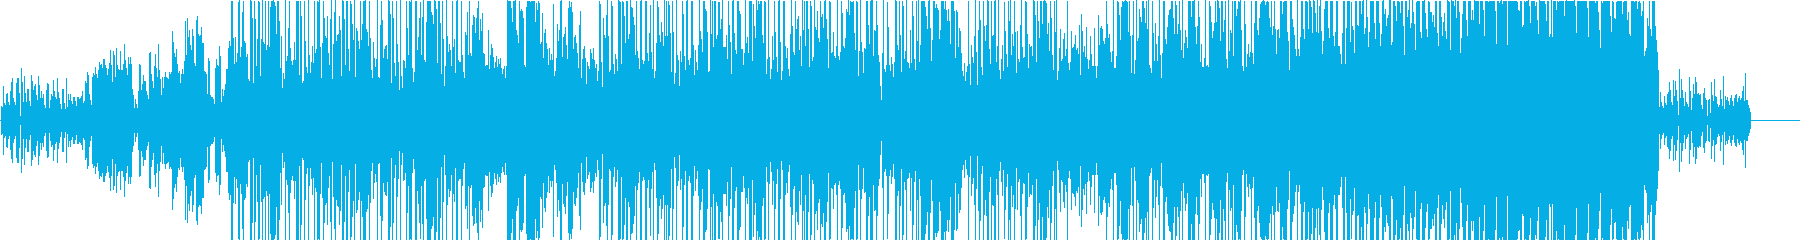 FoolFor日記の再生済みの波形